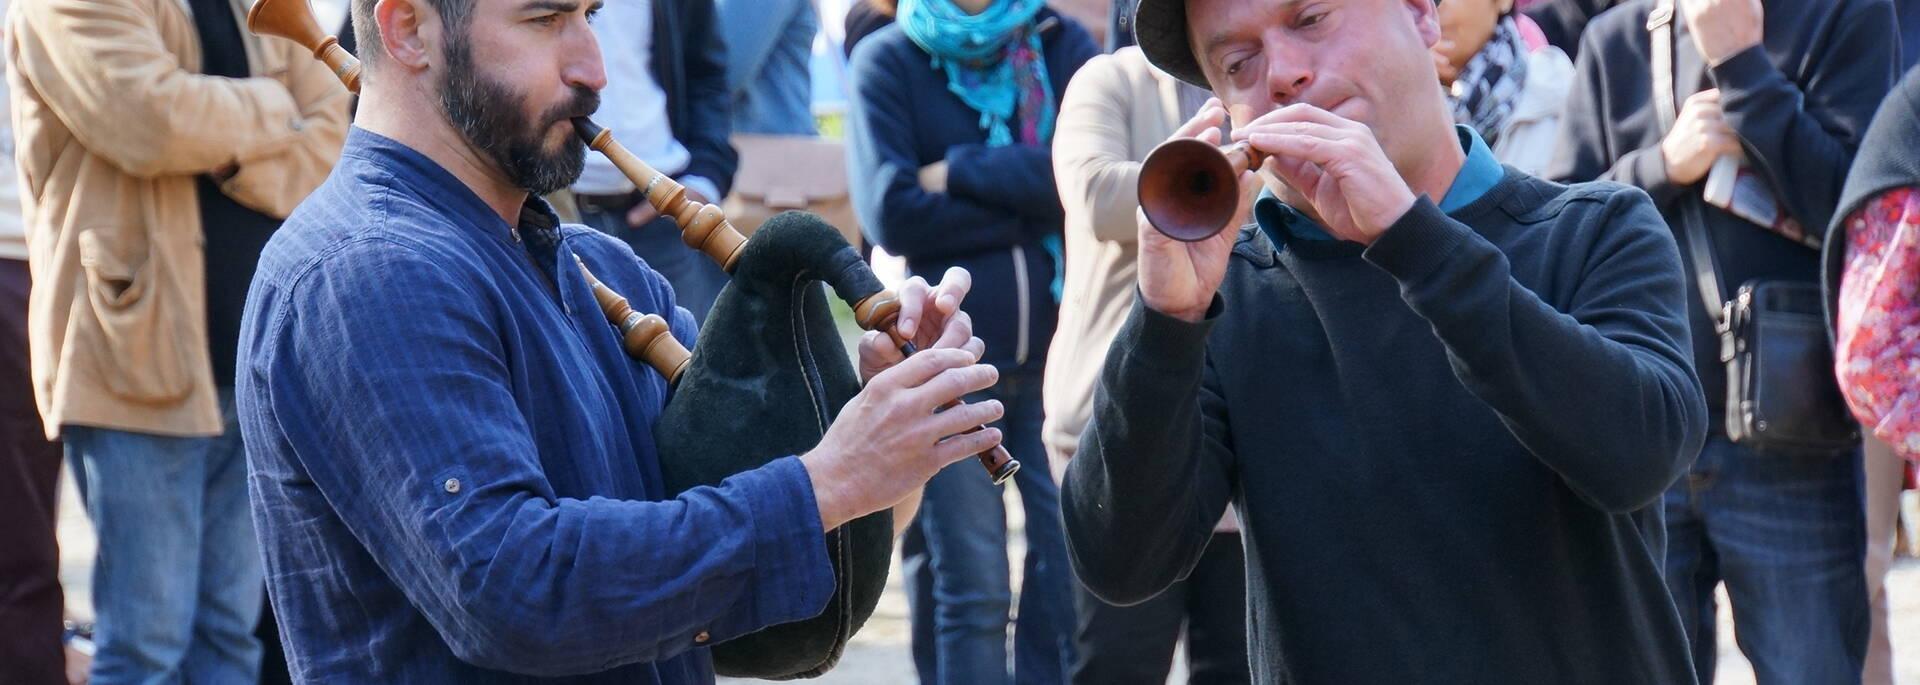 Sonneurs bretons à Gourin